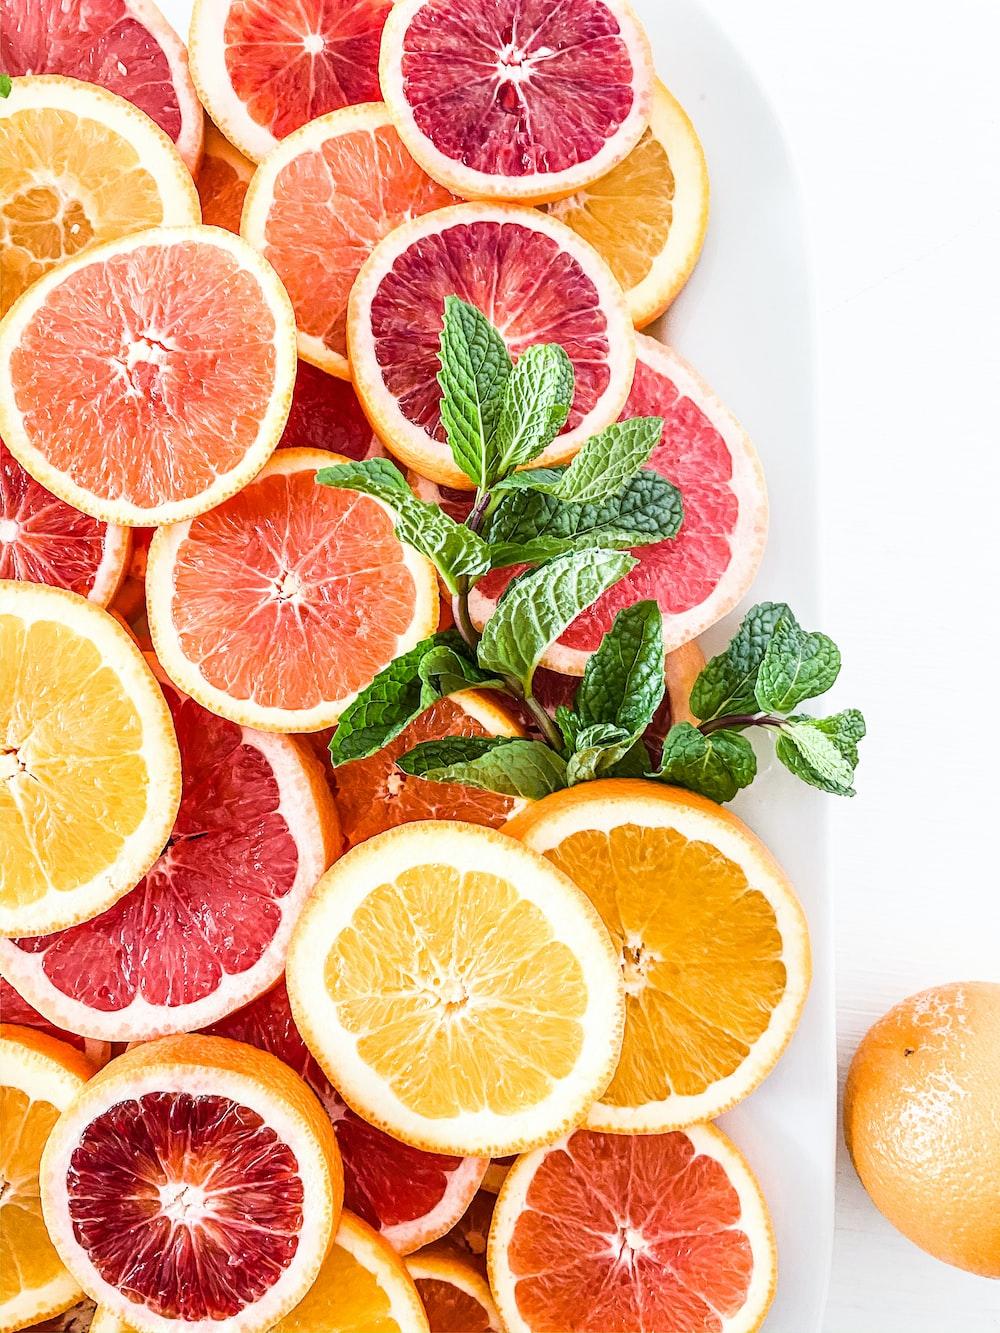 sliced orange